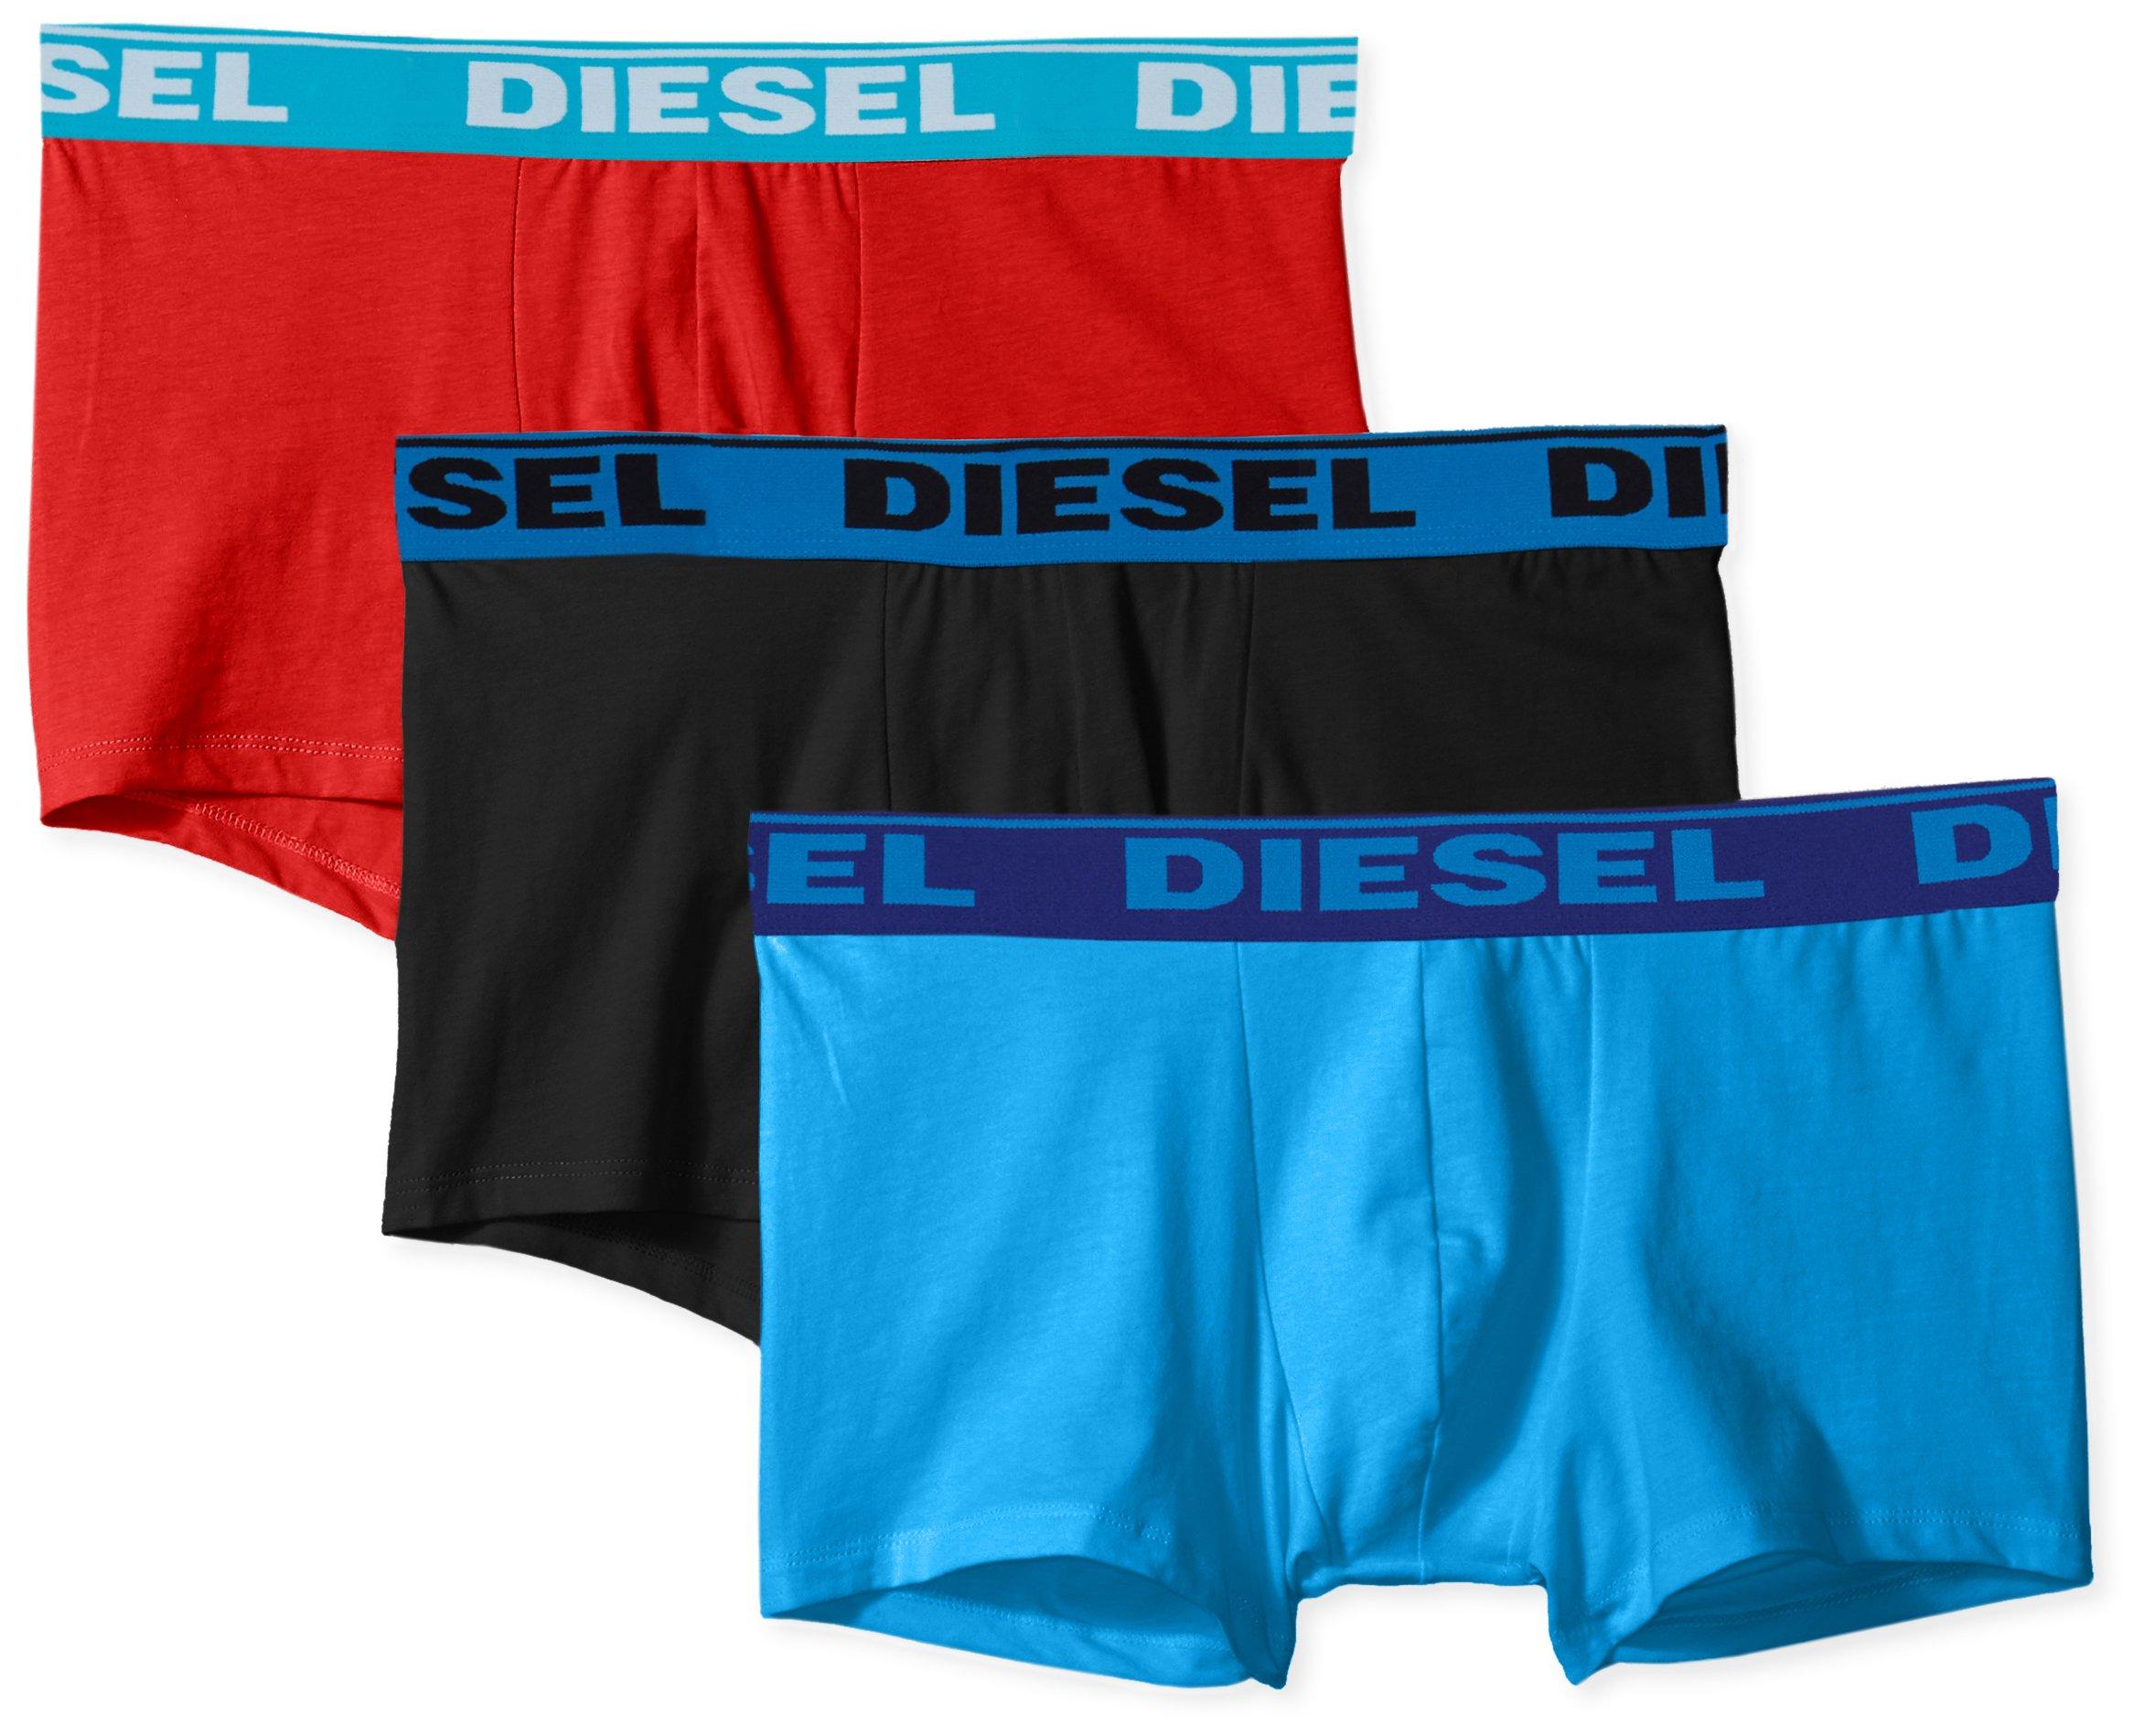 DIESEL Fresh /& Bright Boxer Trunks Mens Underwear 3 Pack Blue Shorts 100/% Cotton